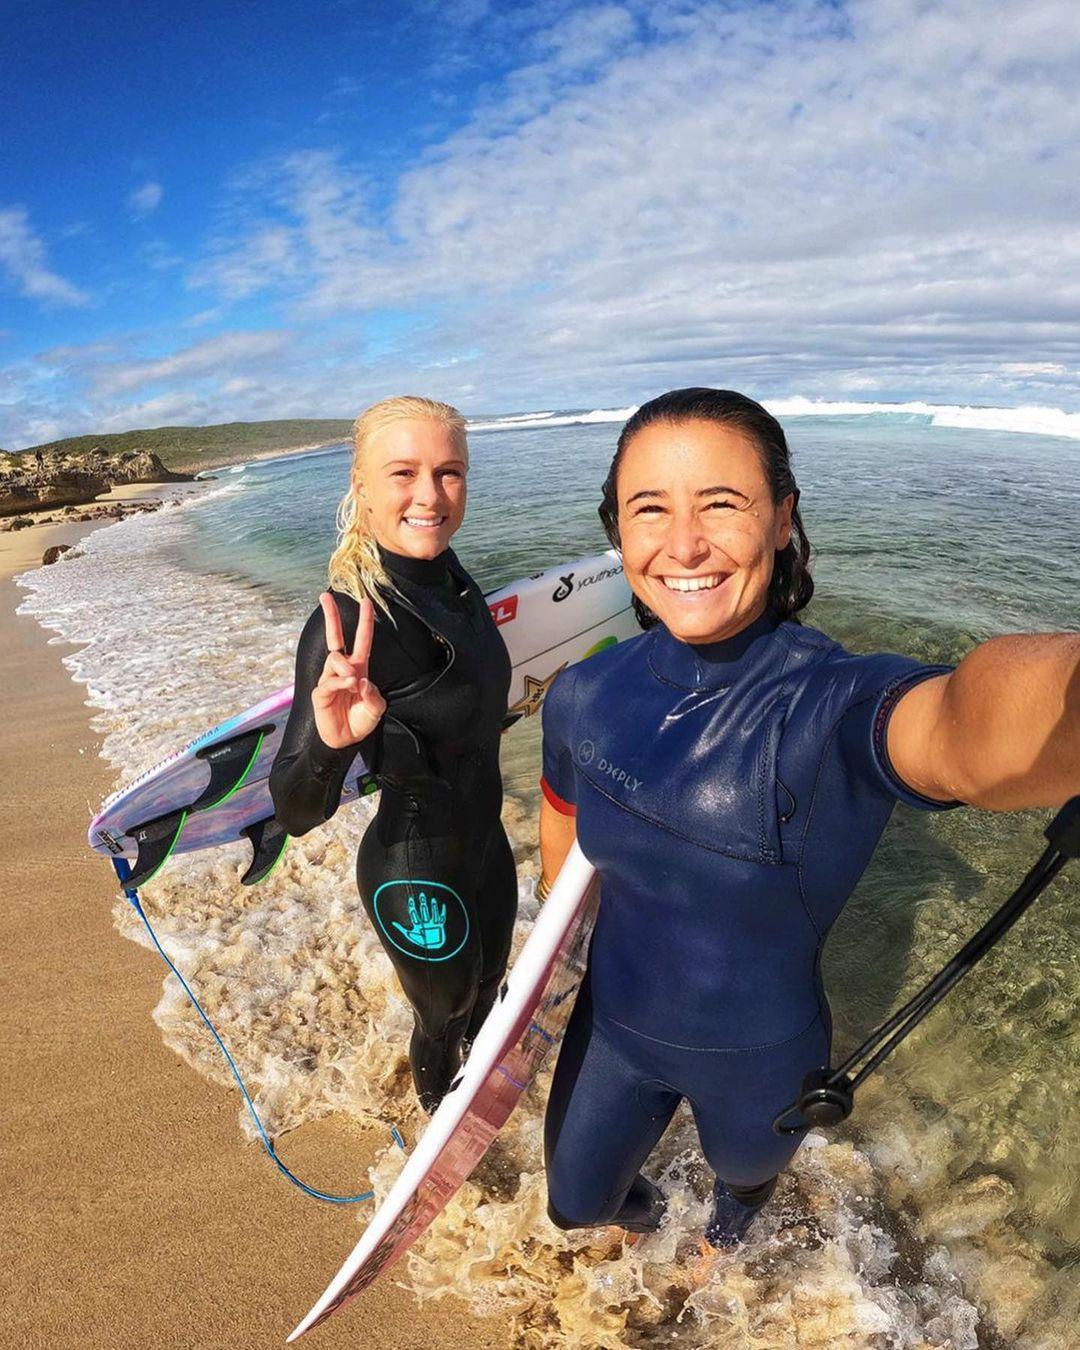 tatiana weston-webb johanne defay bikini string thong ass margaret river pro surf 2021 wsl